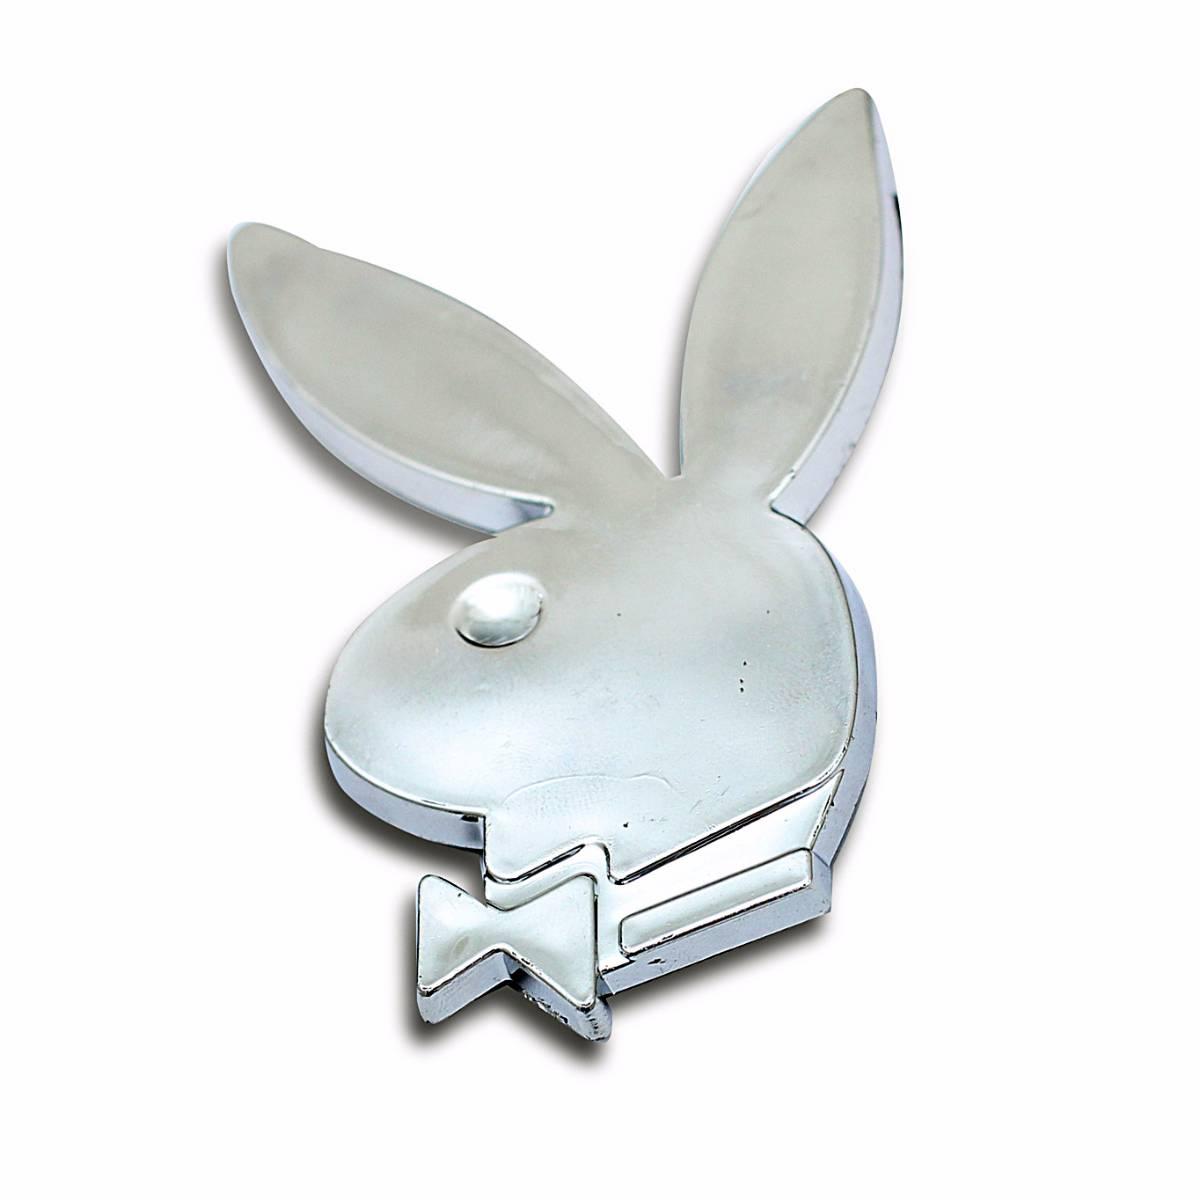 Emblem Variasi Playboy